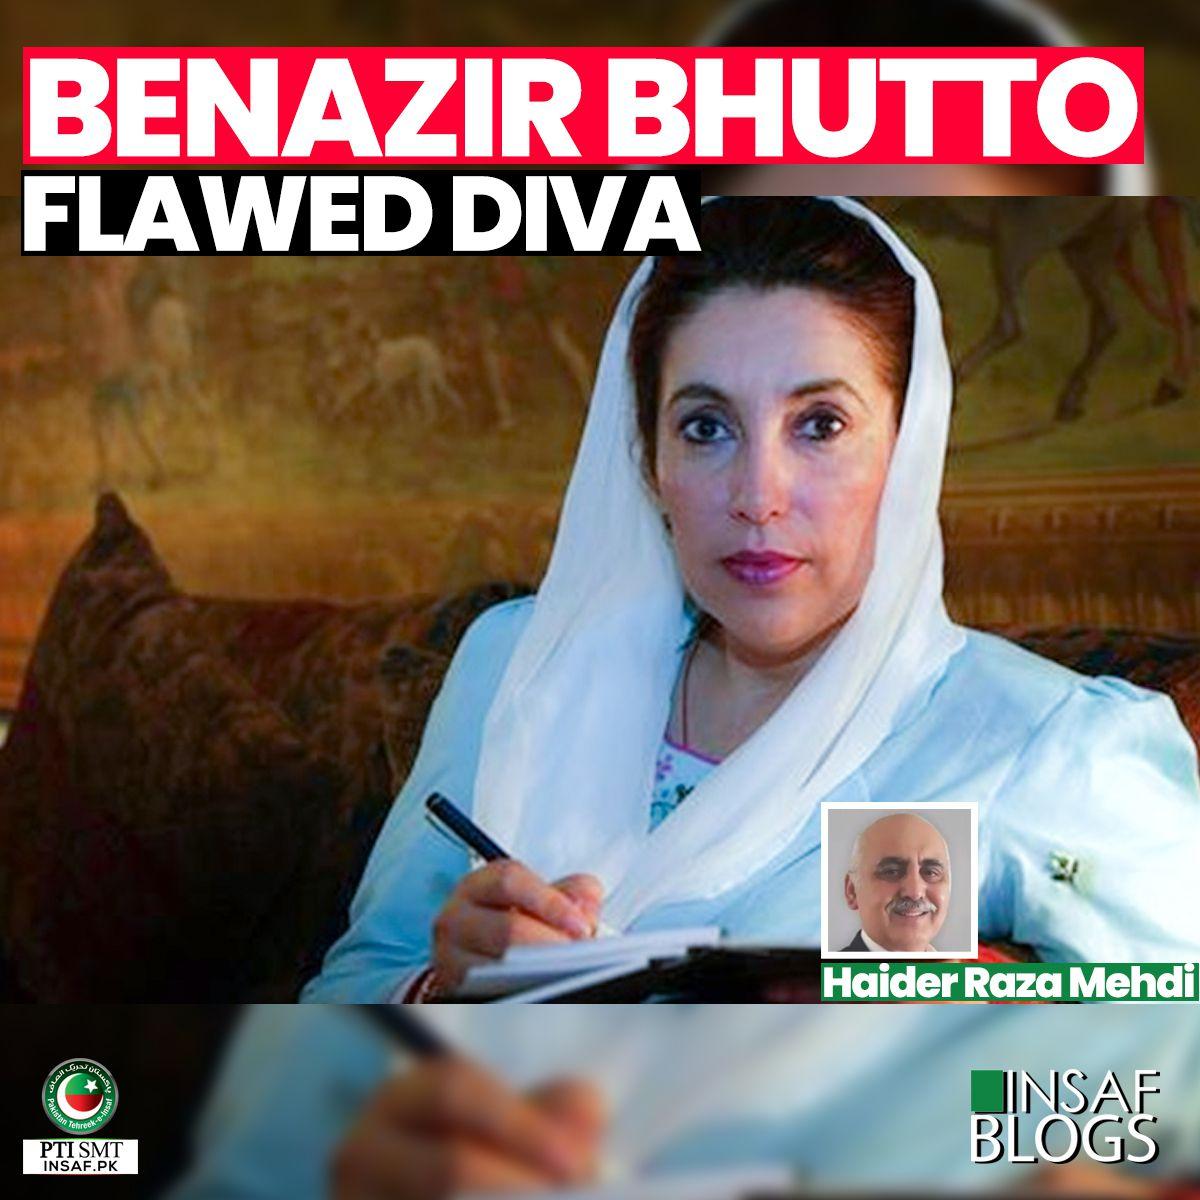 Benazir-Bhutto-Flawed Diva-insaf-blog